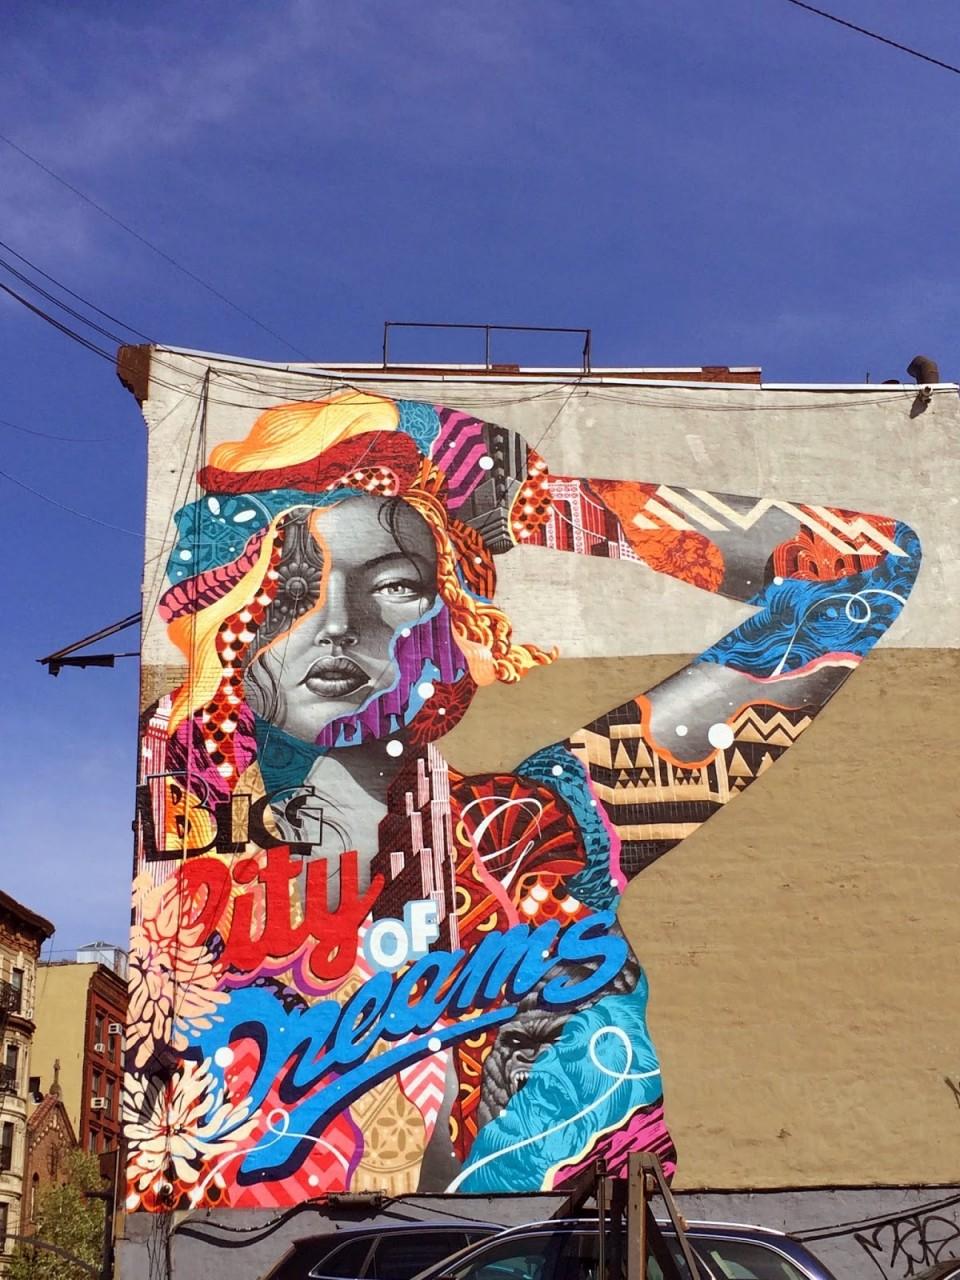 1. Нью-Йорк Сити, Нью-Йорк, США граффити, стрит-арт, художники